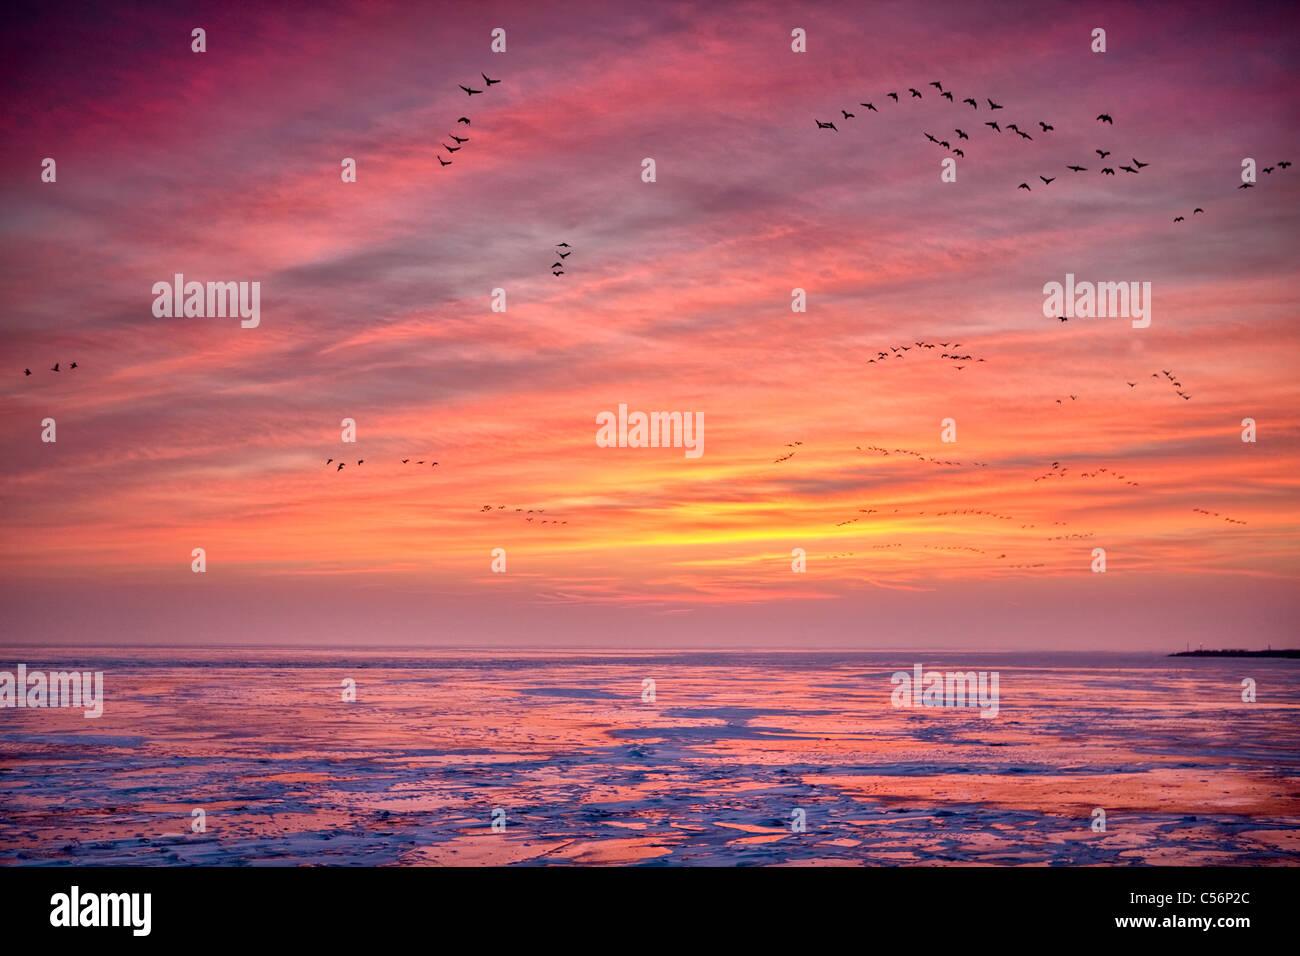 The Netherlands, Oosterdijk, Winter, snow, view on frozen lake called IJsselmeer. Sunrise. Geese foraging. - Stock Image